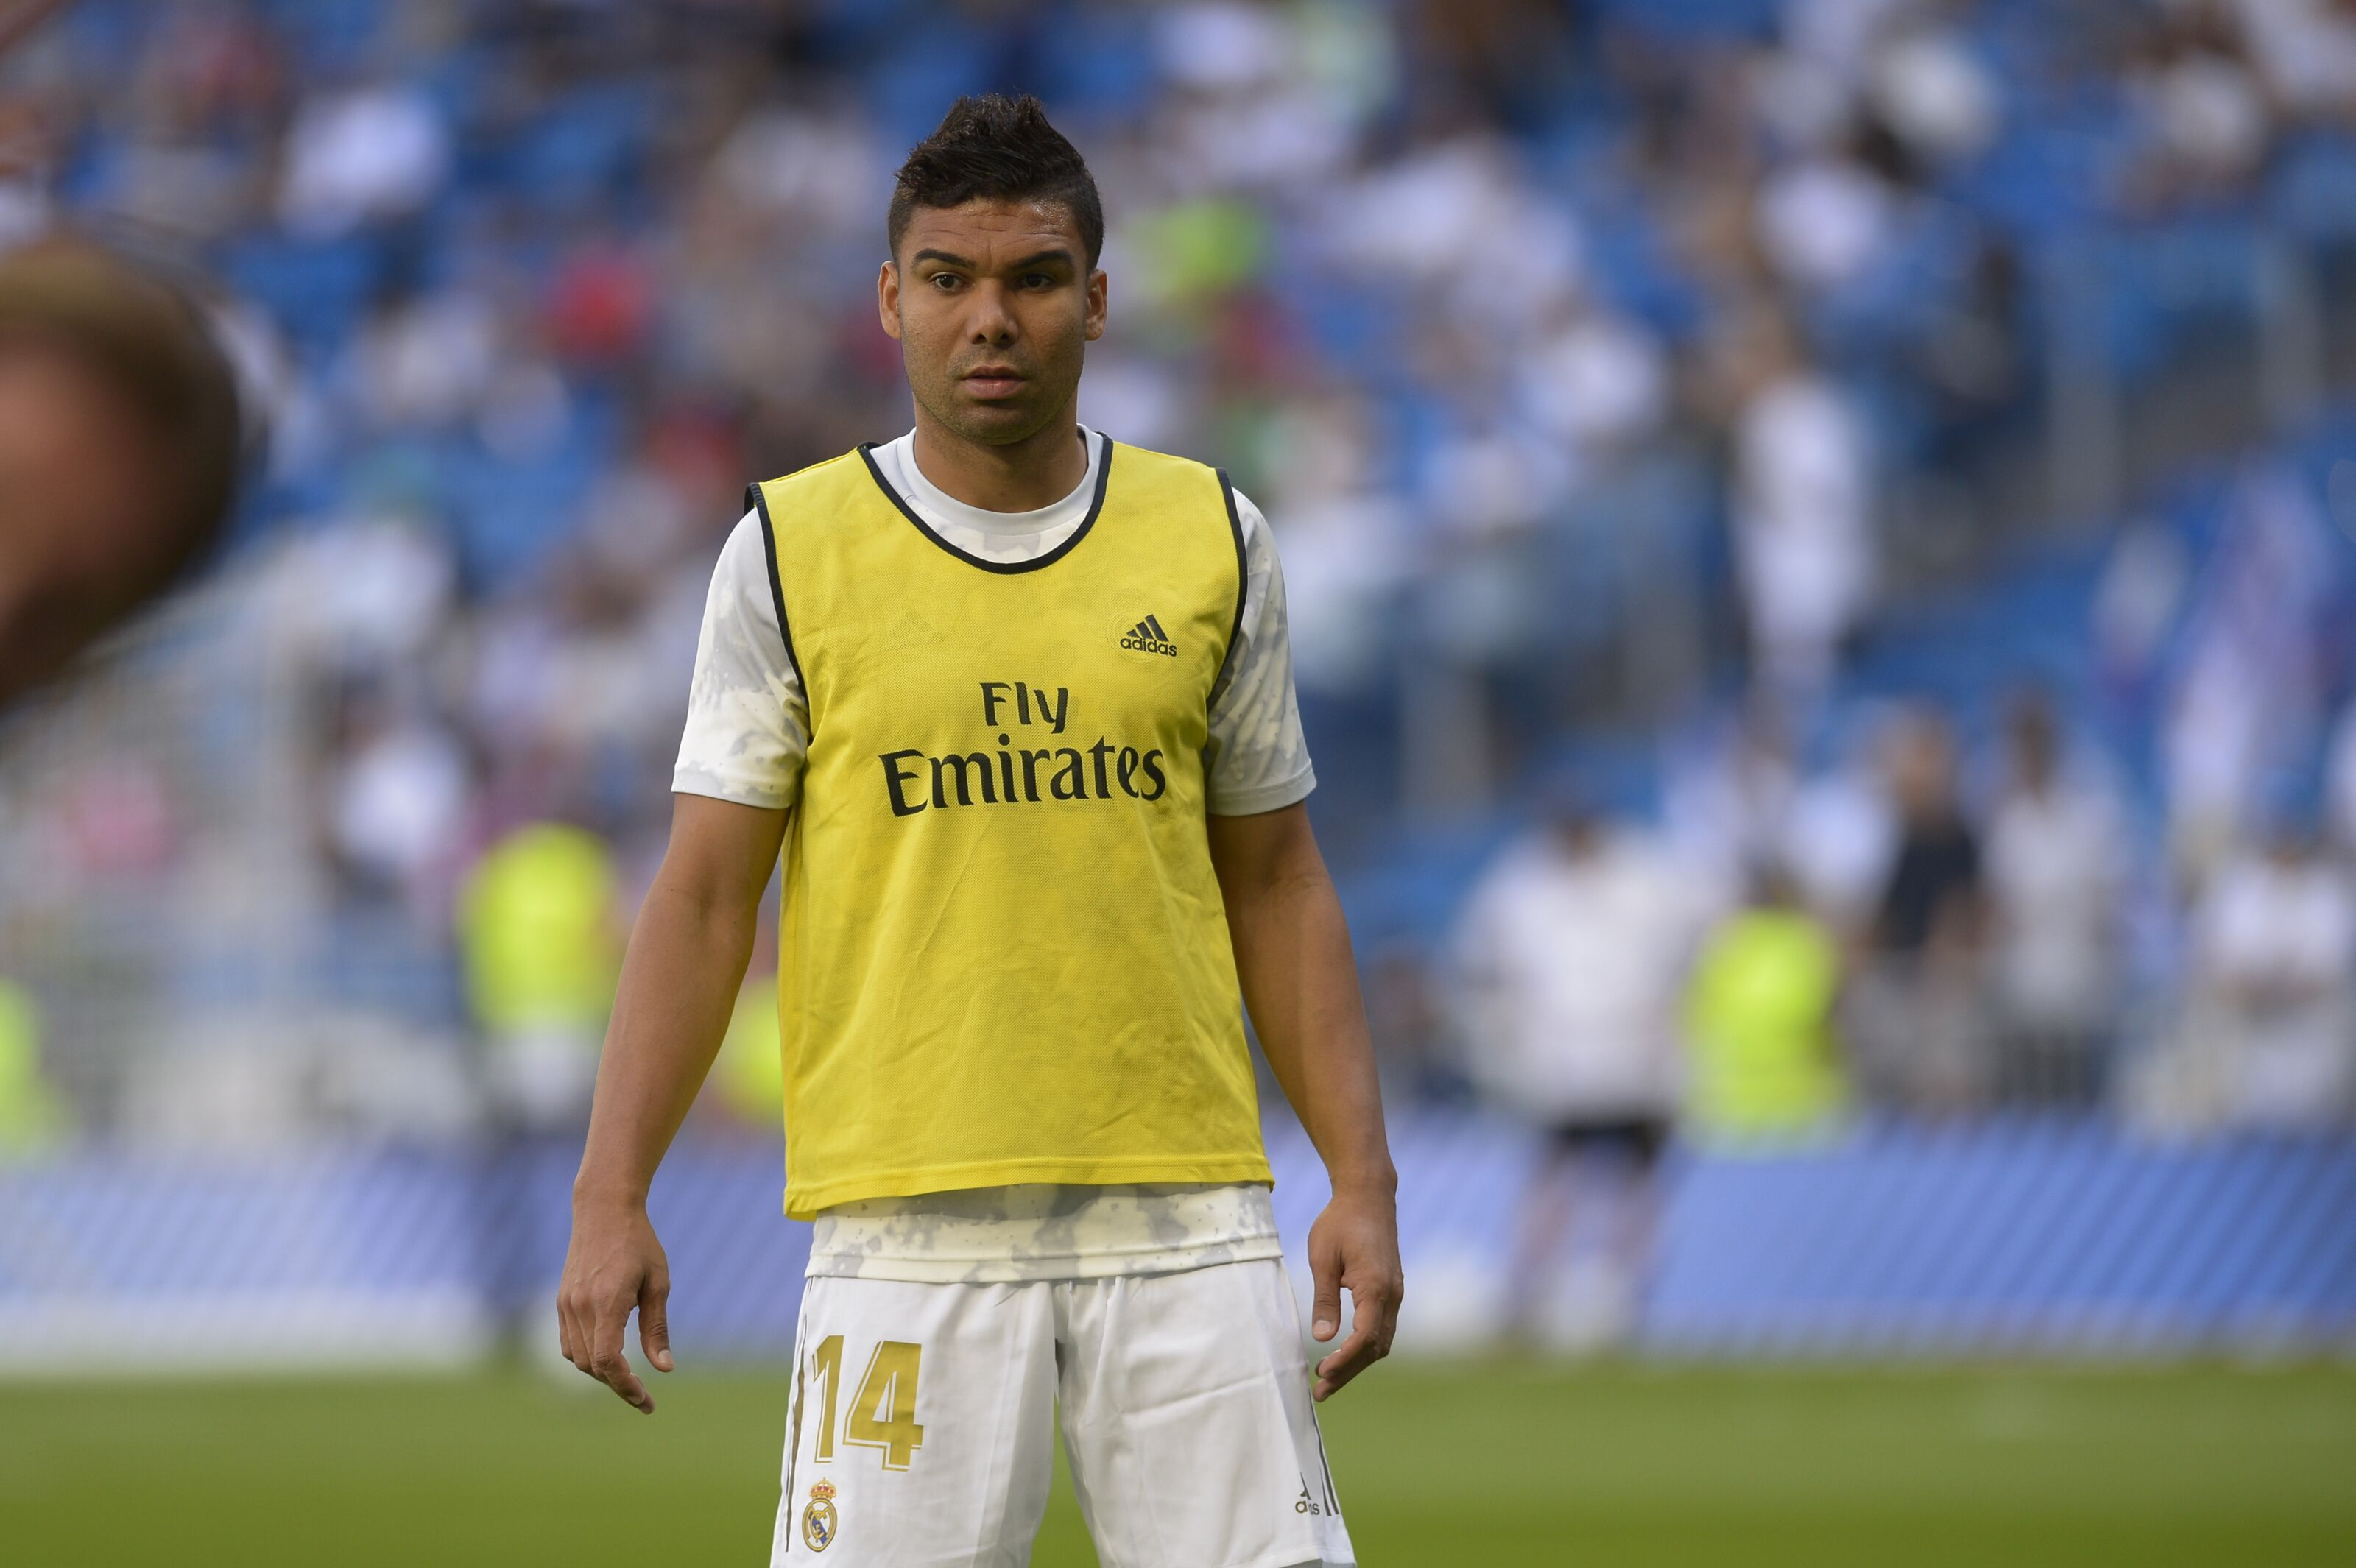 Real Madrid: Casemiro the striker?